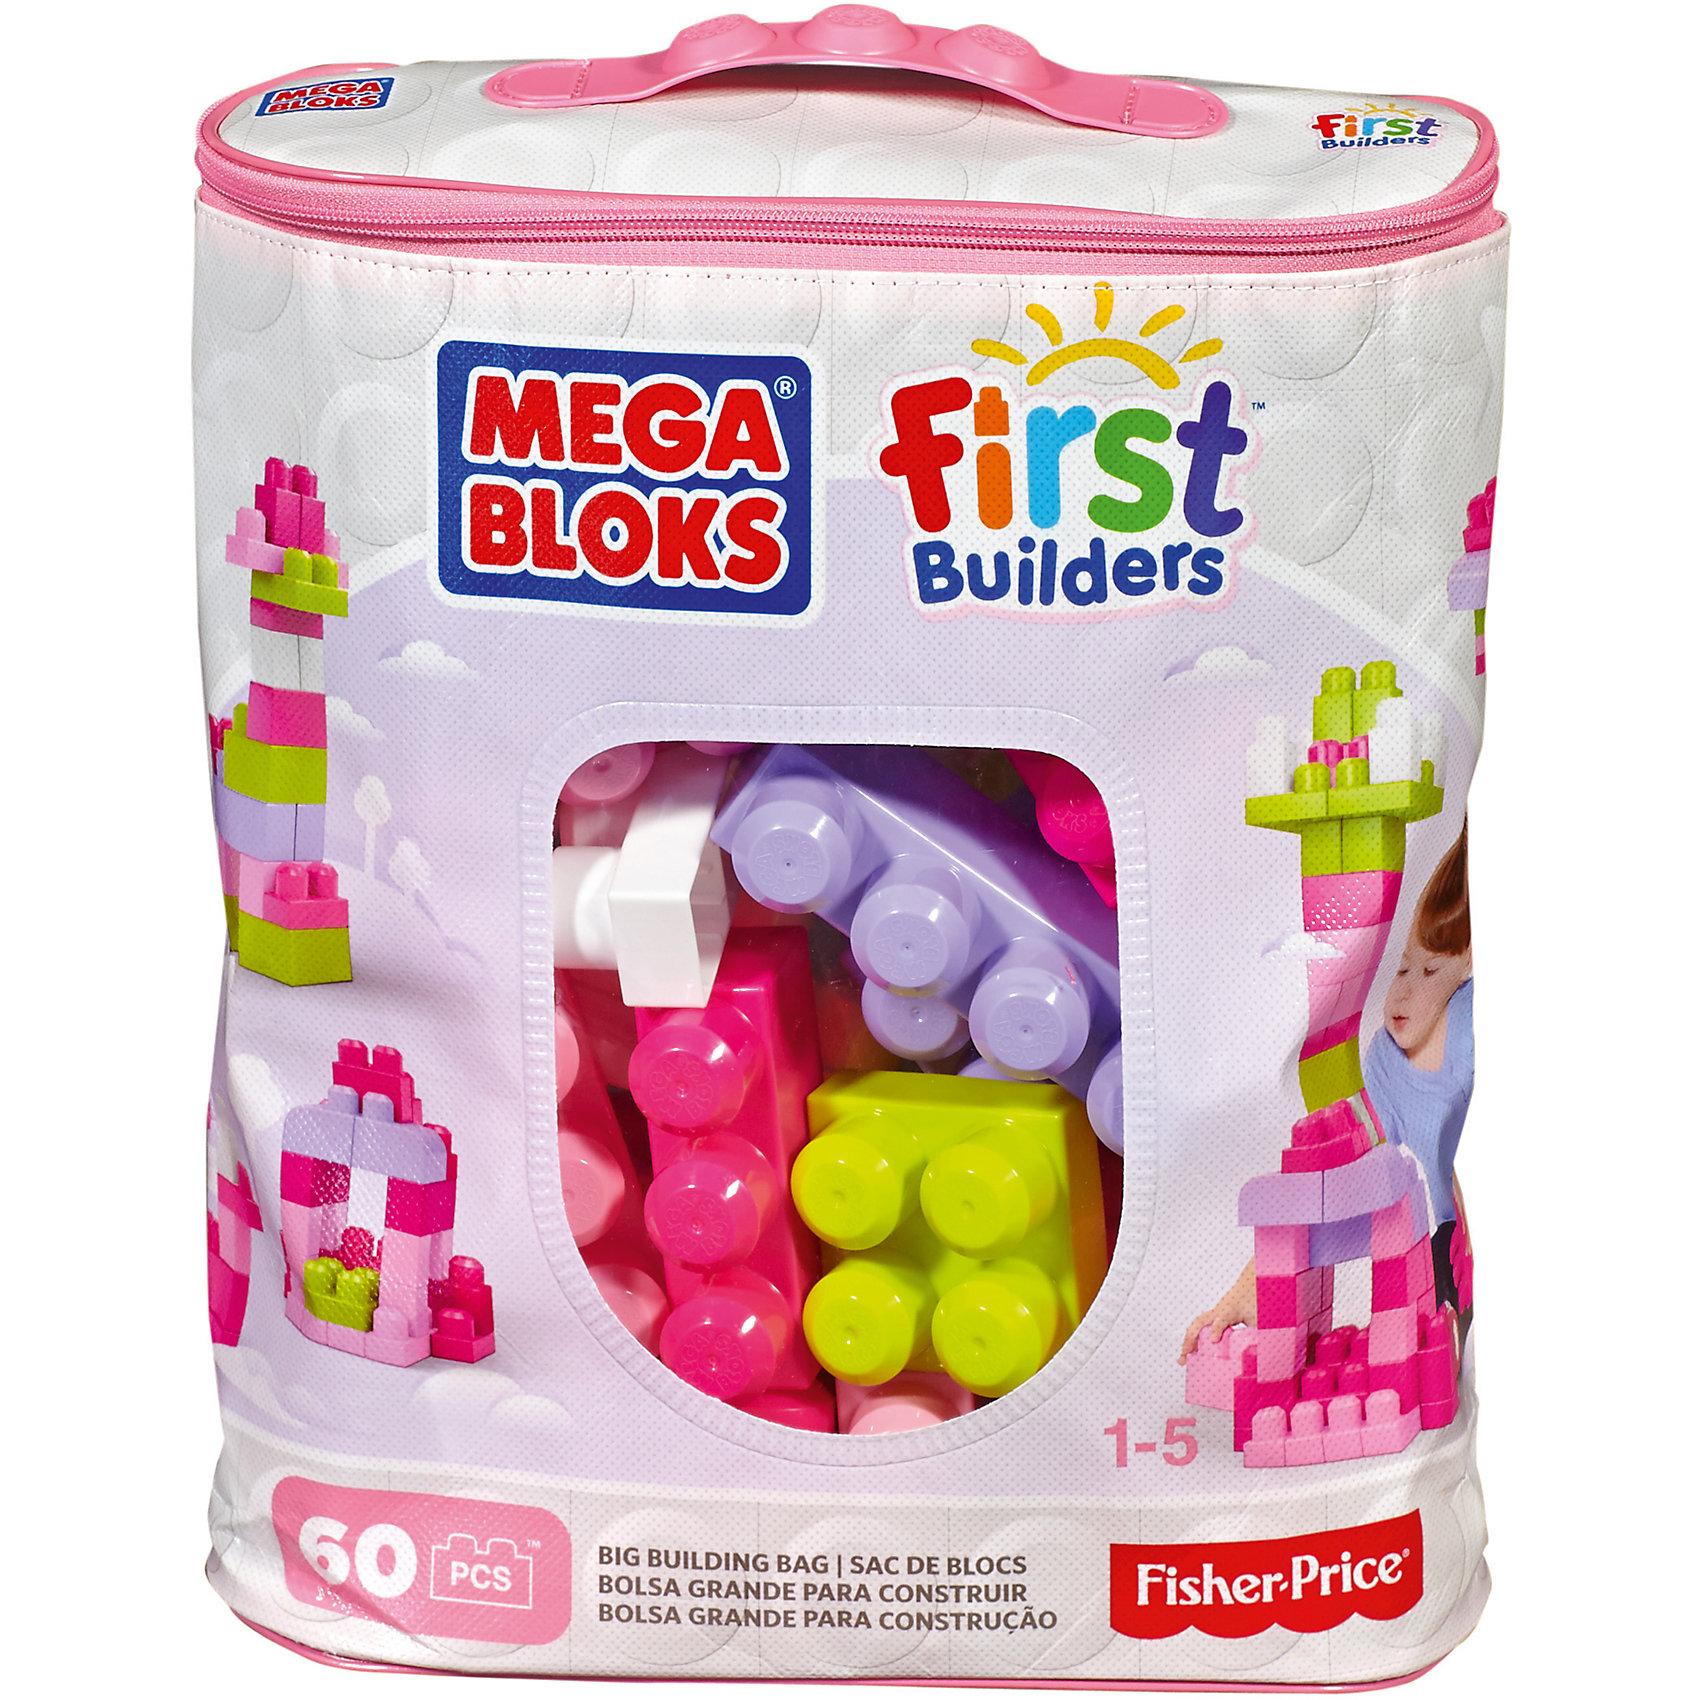 Конструктор из 60 деталей, MEGA BLOKS First Builders<br><br>Ширина мм: 345<br>Глубина мм: 290<br>Высота мм: 100<br>Вес г: 907<br>Возраст от месяцев: 12<br>Возраст до месяцев: 60<br>Пол: Унисекс<br>Возраст: Детский<br>SKU: 4791139